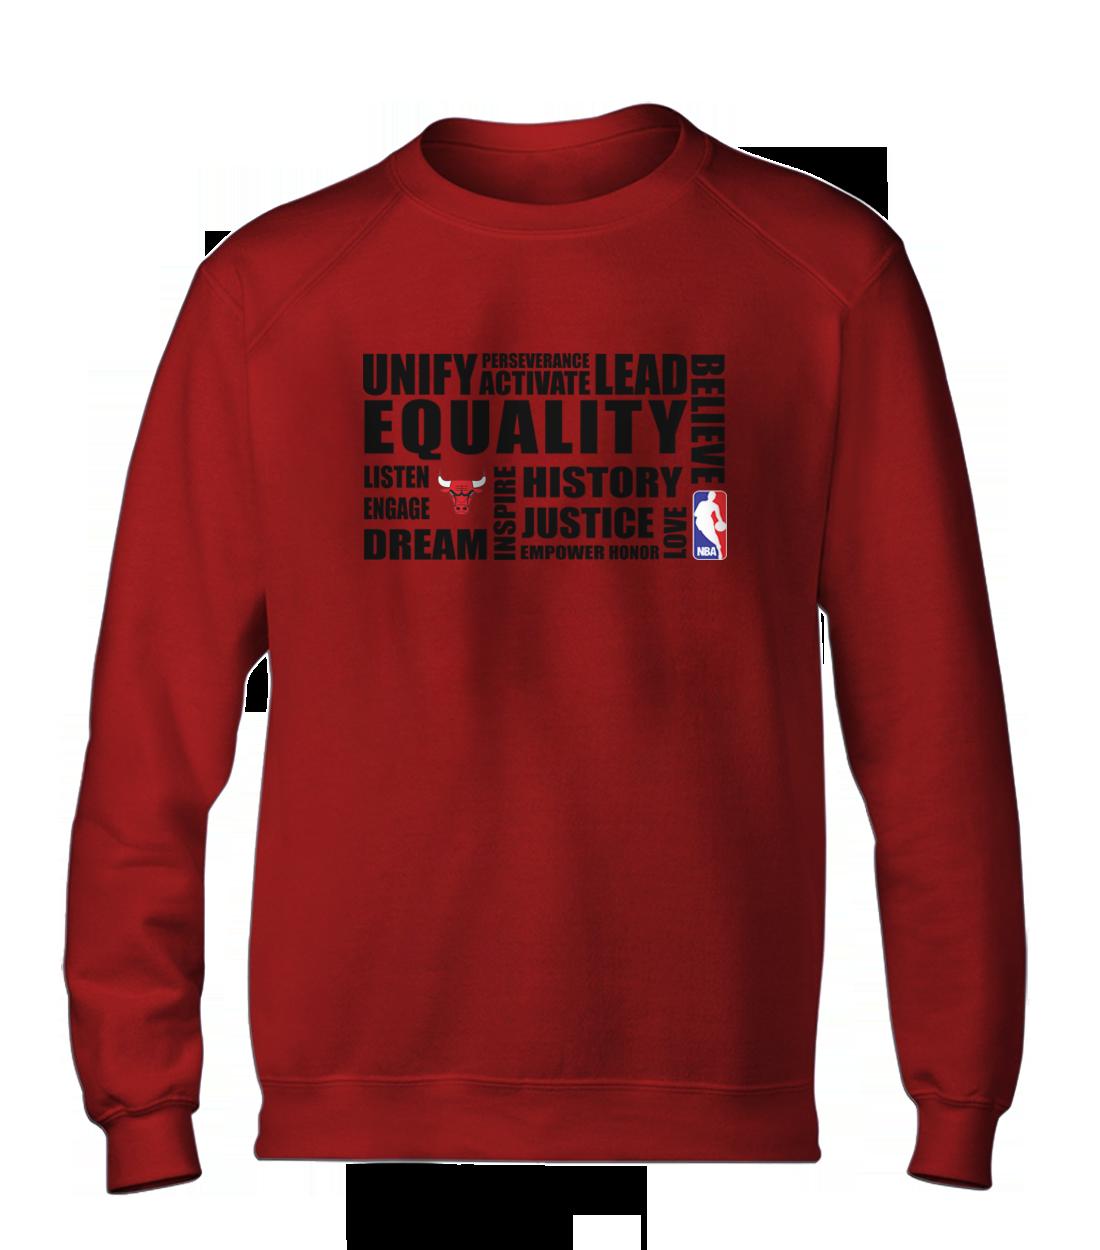 EQUALITY Chicago Bulls Basic (BSC-RED-NP-292-NBA-CHI.black)